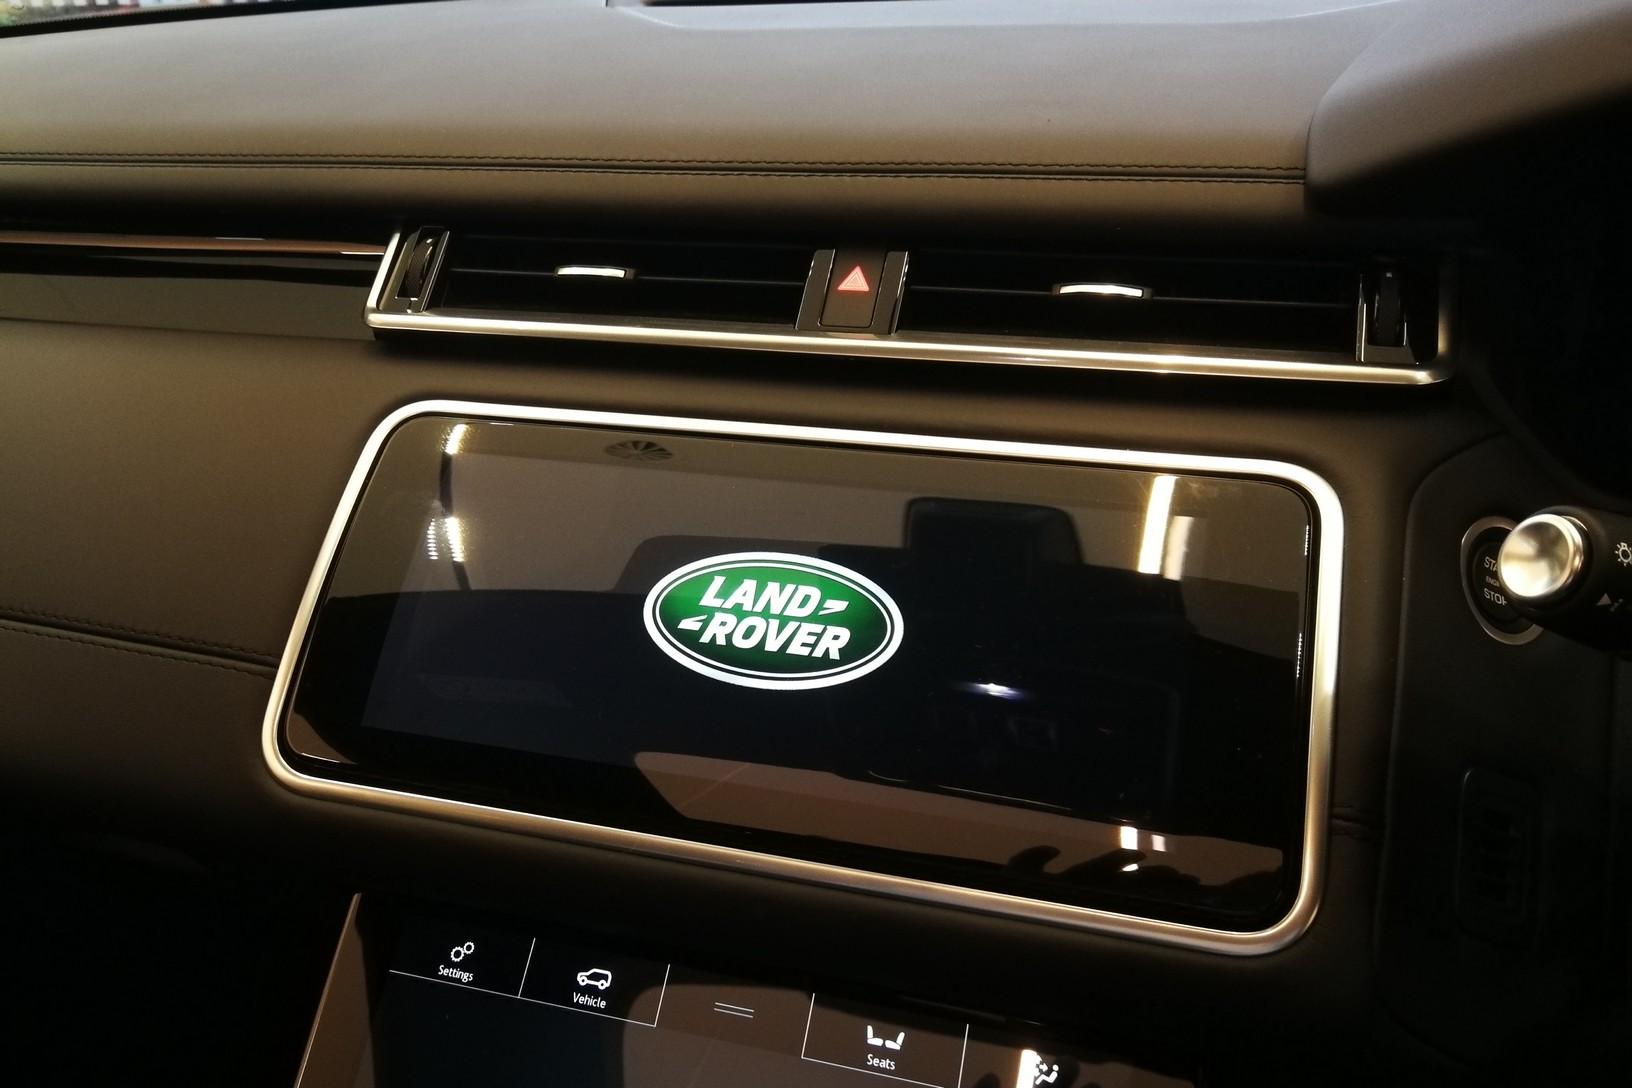 Land Rover Range Rover Velar 5.0 P550 SVAutobiography Dynamic Edition 5dr Auto image 8